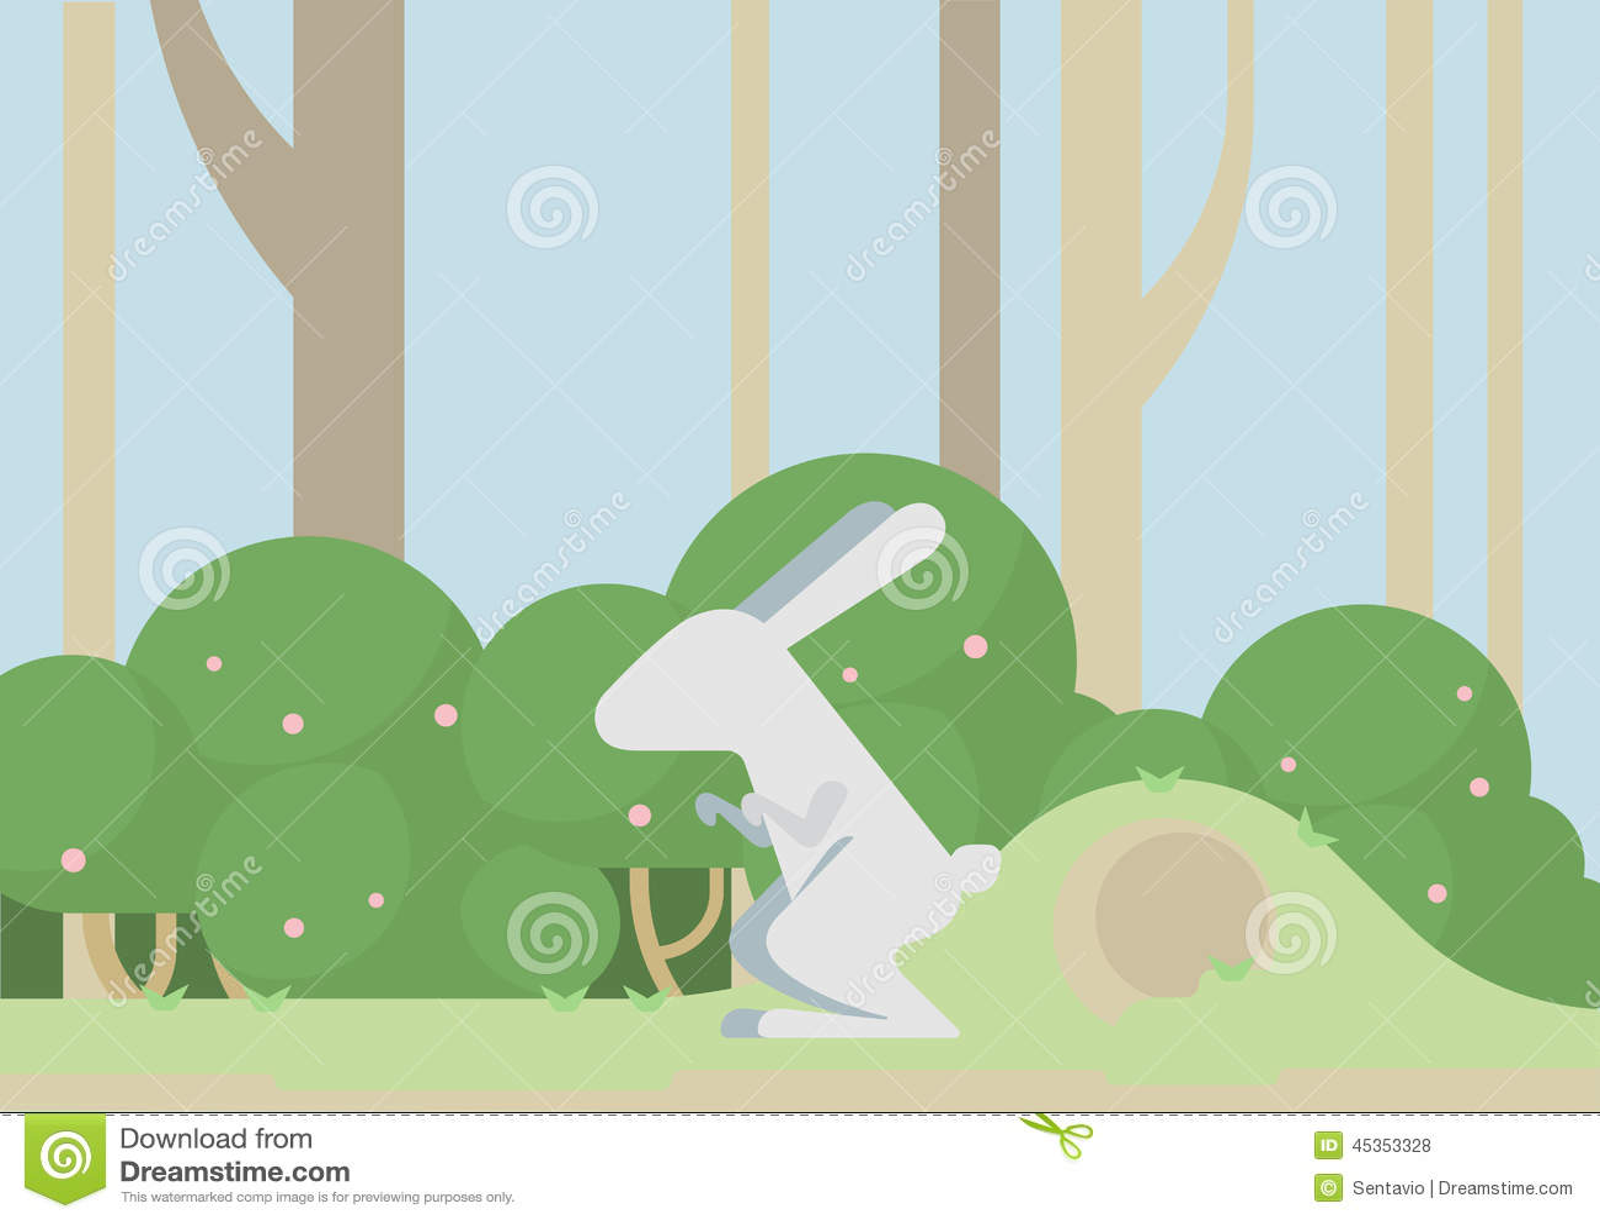 Bunny Hare Rabbit Flat Design Cartoon Vector Wild Animal Stock ... on lion on golf course, lamb on golf course, monkey on golf course, eagle on golf course, coyote on golf course, baboon on golf course, cow on golf course, gopher on golf course, helicopter on golf course, kangaroo on golf course, fox on golf course, bear on golf course, elk on golf course, fish on golf course, pigs on golf course, geese on golf course, ram on golf course, raccoons on golf course, deer on golf course, rattlesnake on golf course,